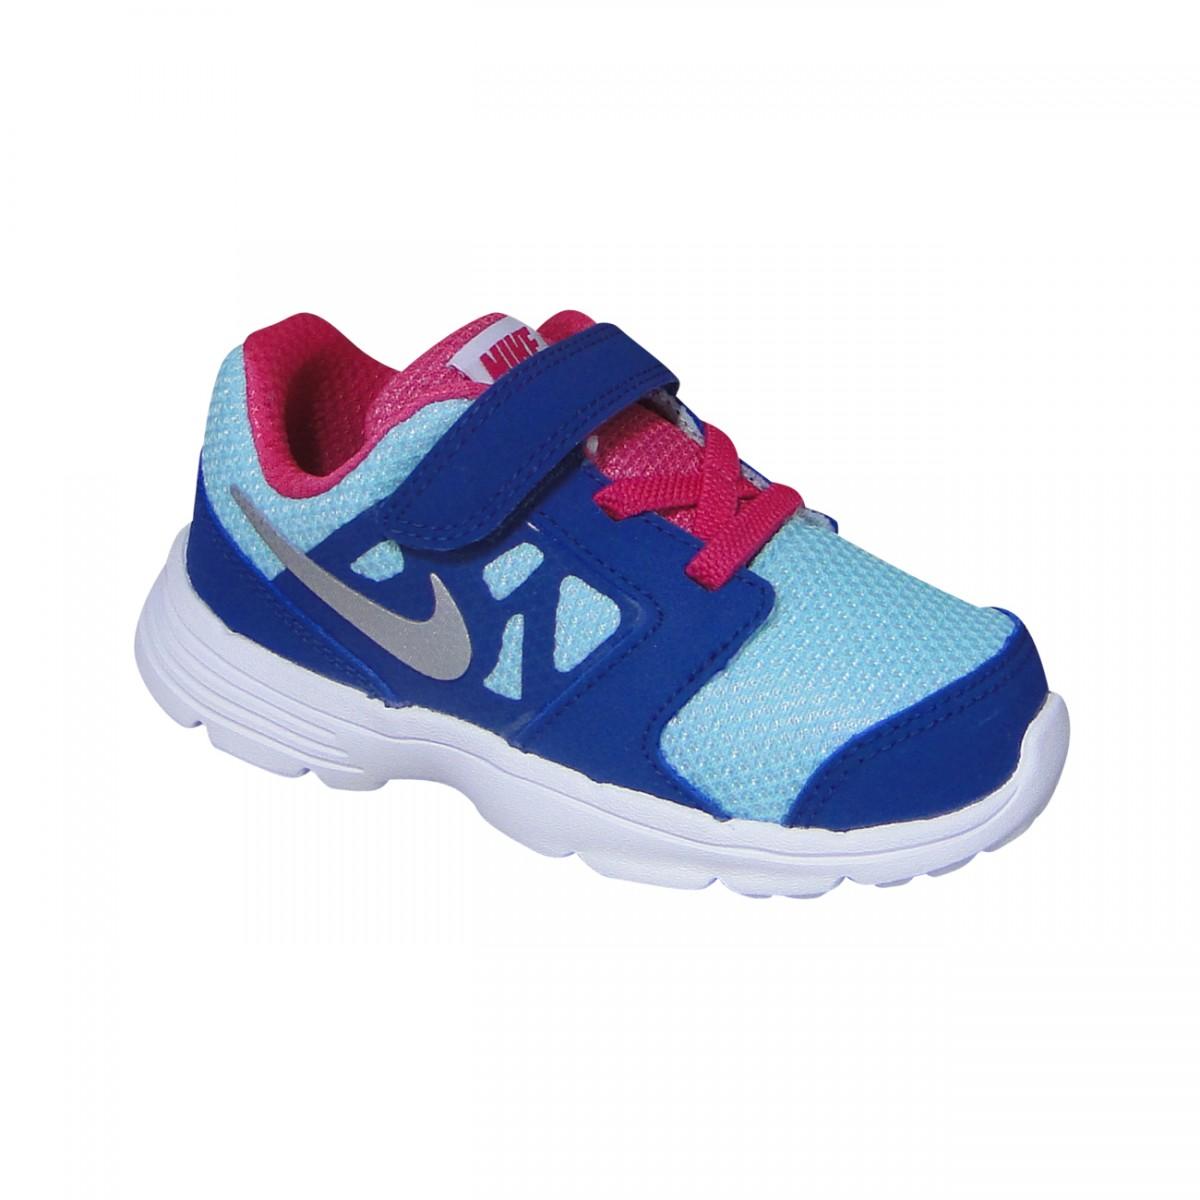 db0e895f5ee Tenis Nike Downshifter 6 Infantil 685164 402 - Marinho Branco Azul ...